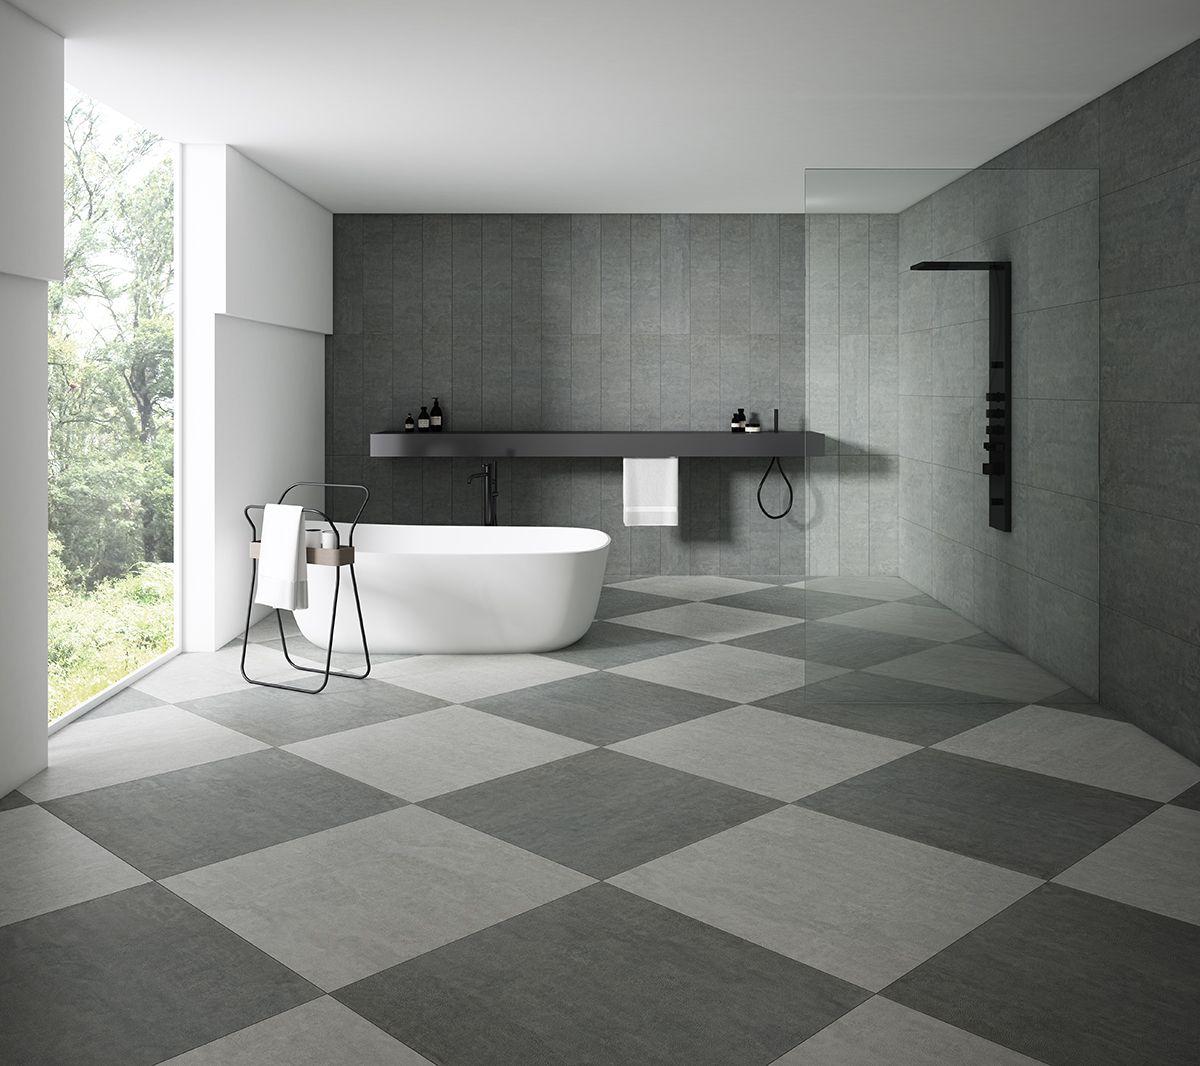 Grey Bathroom Floor Tile Creating A Statement In This Bathroom Space Bodenfliesen Bad Kacheln Fliesenboden